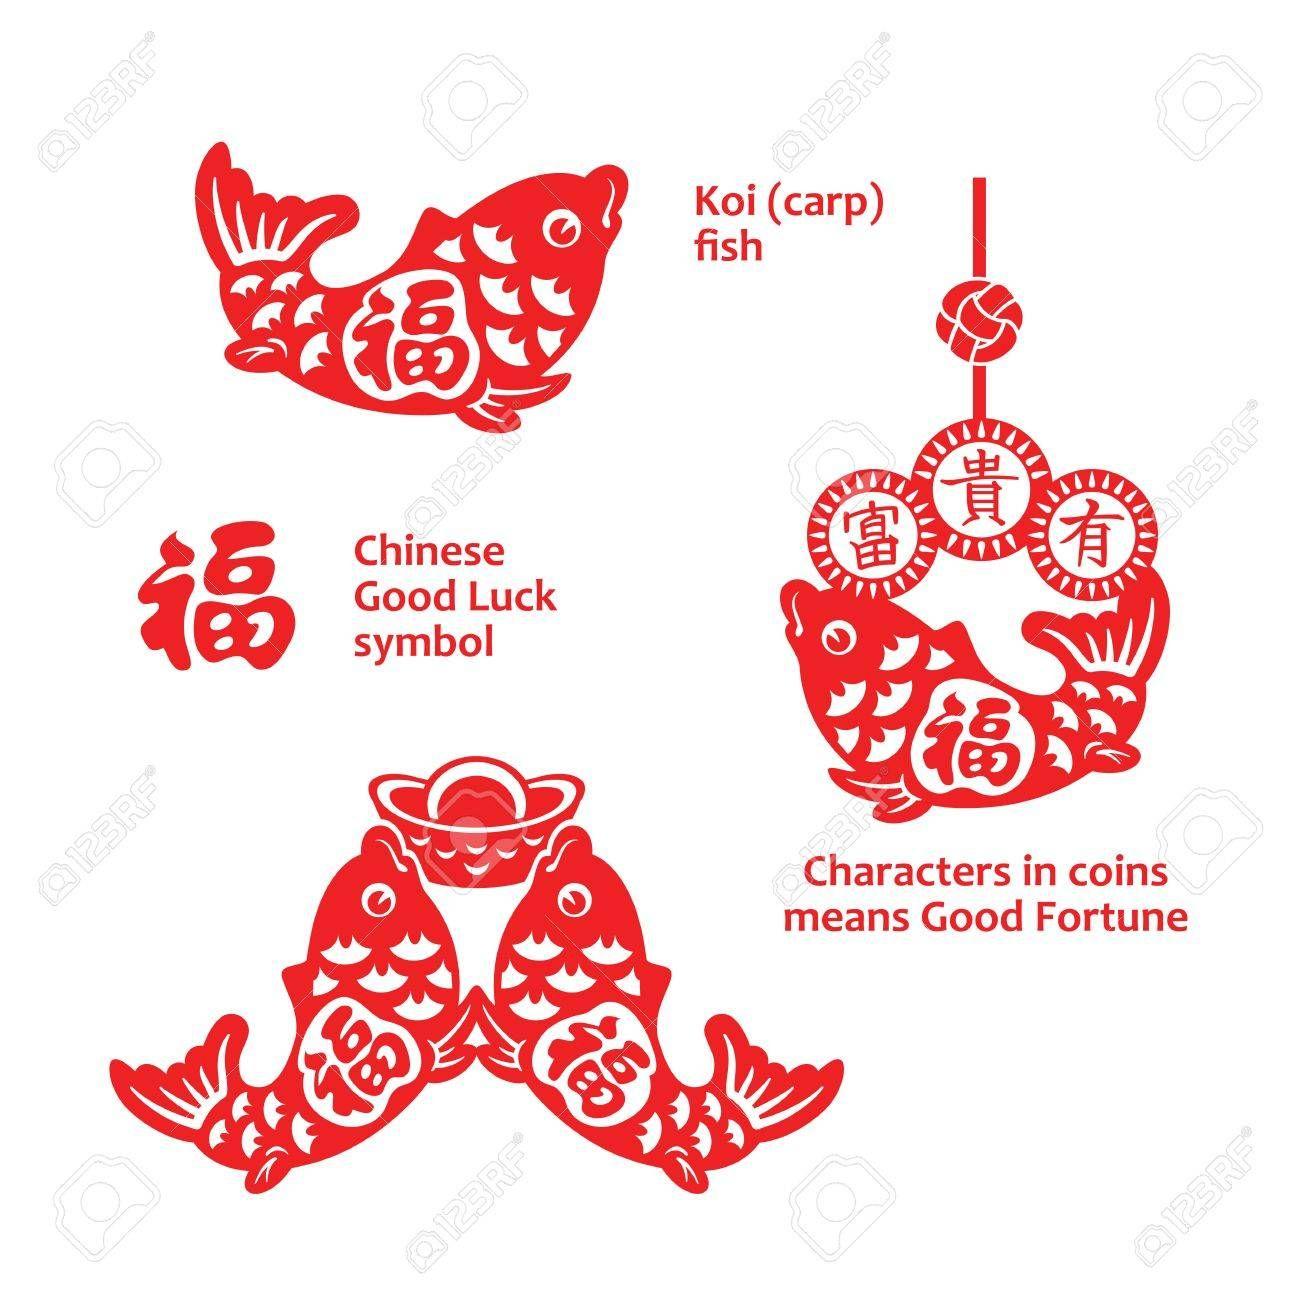 Image Result For Chinese Koi Fish Symbols Pinterest Koi